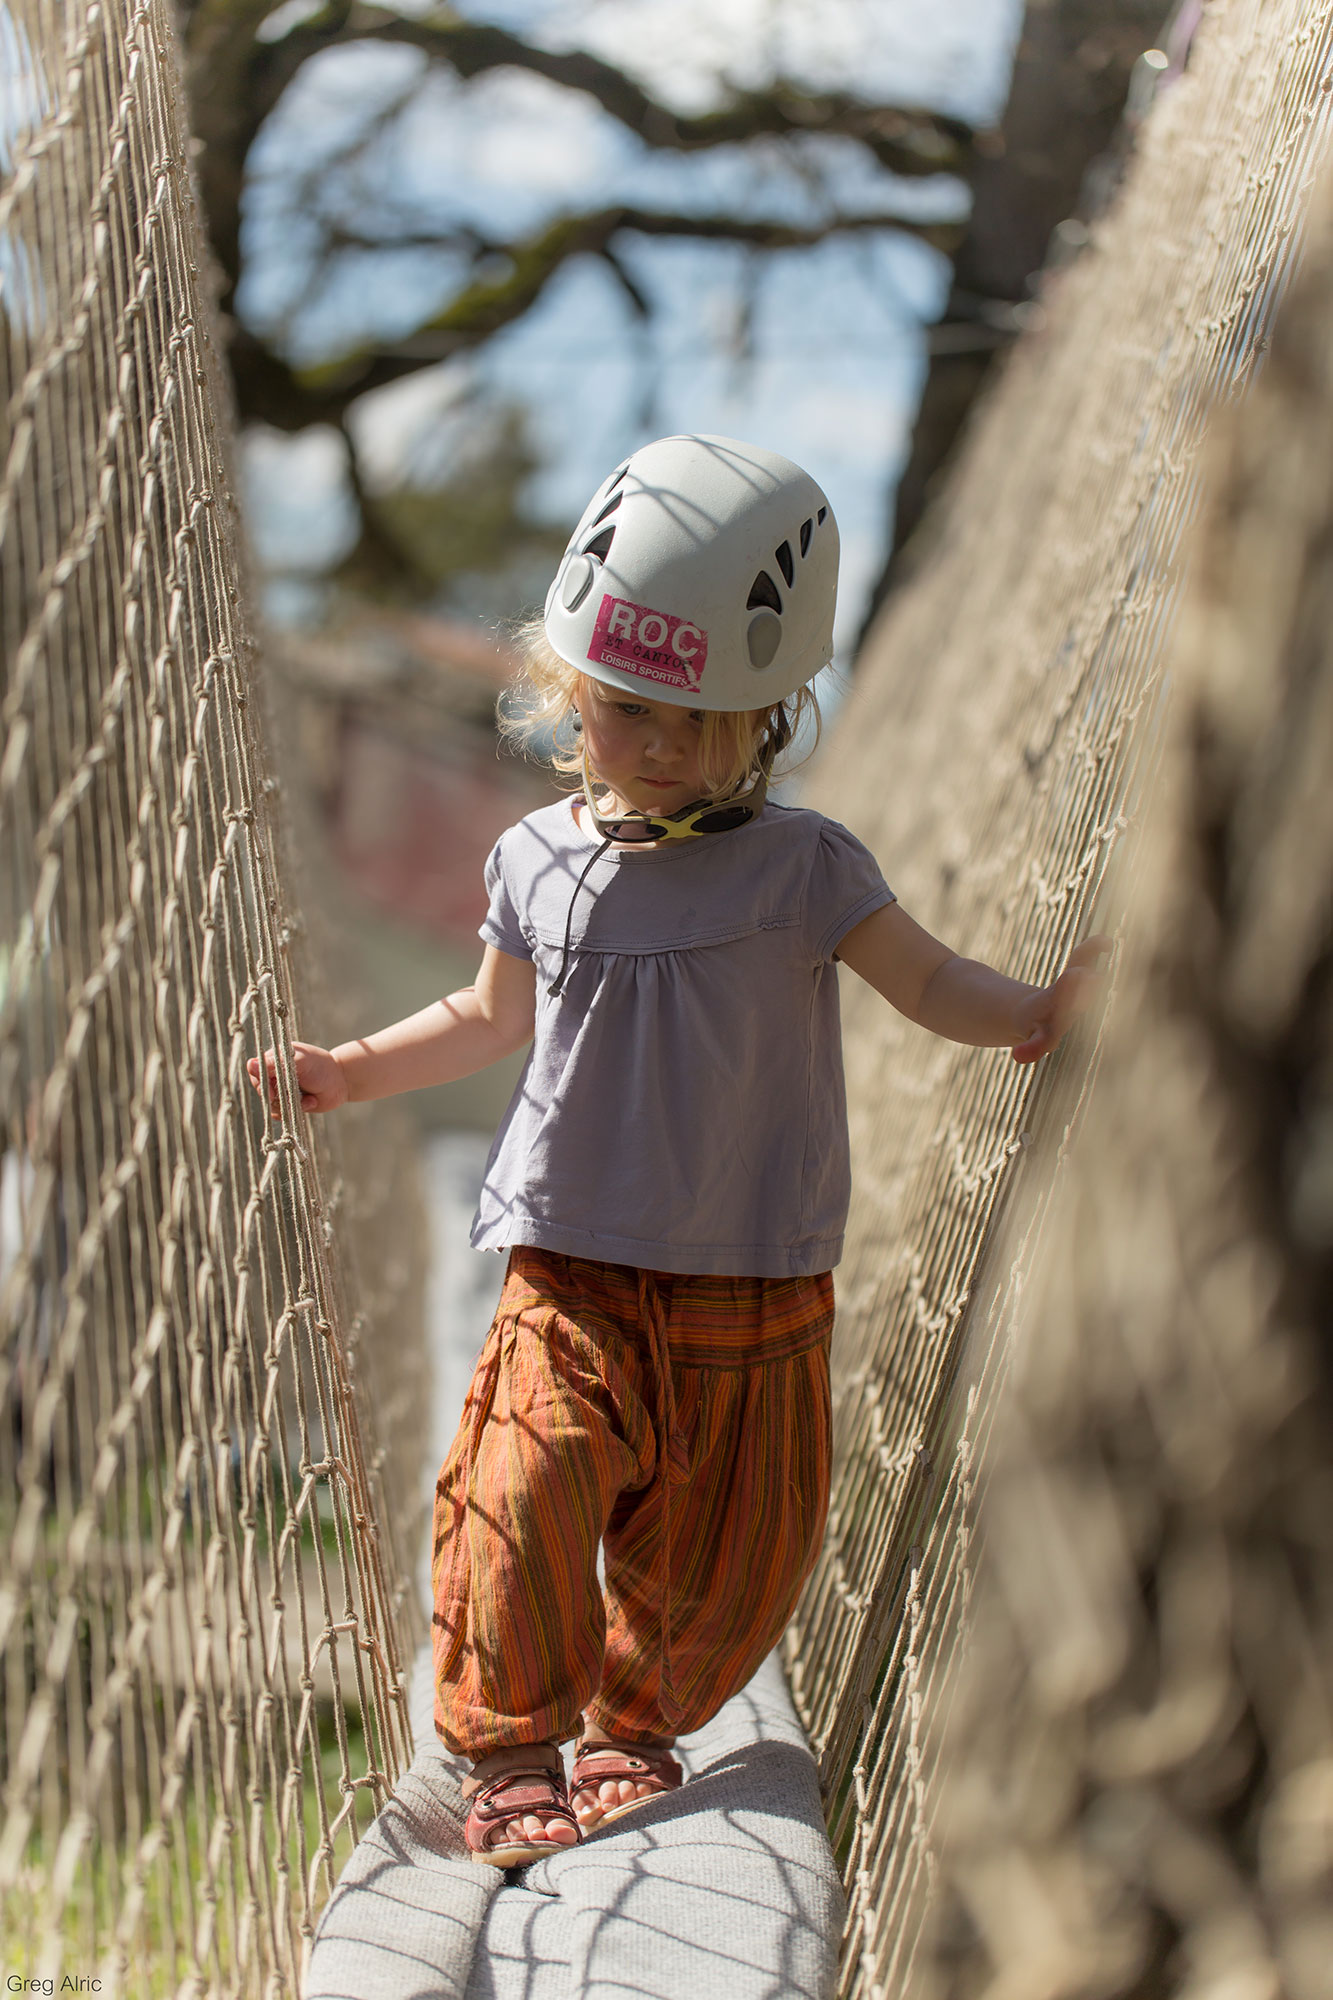 Filet Aerien Enfant - Roq Rando Raid © Greg Alric